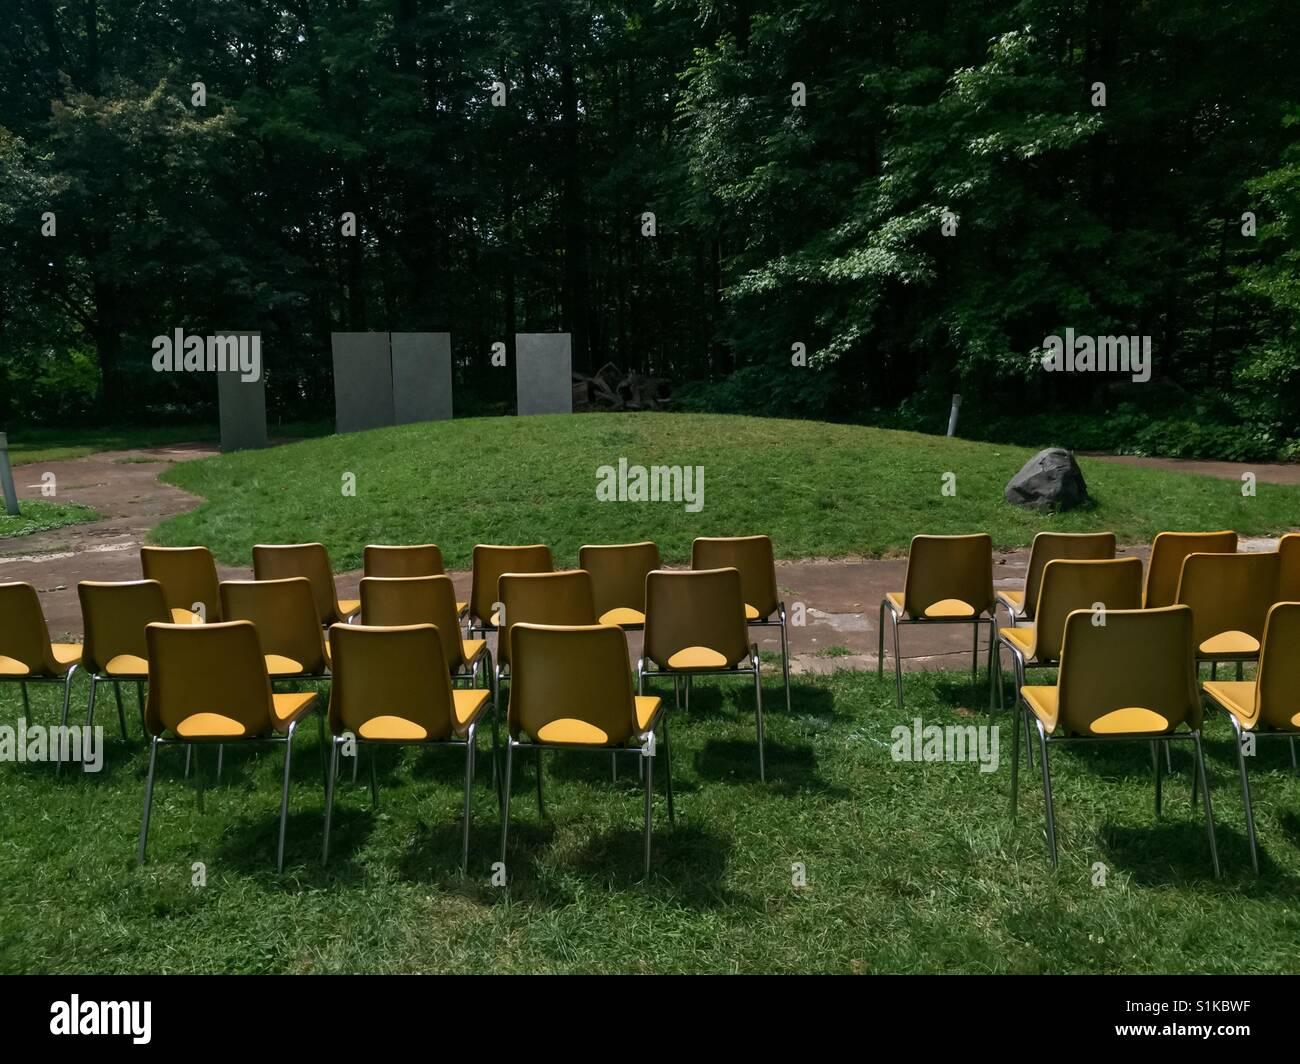 Outdoor gathering set up - Stock Image